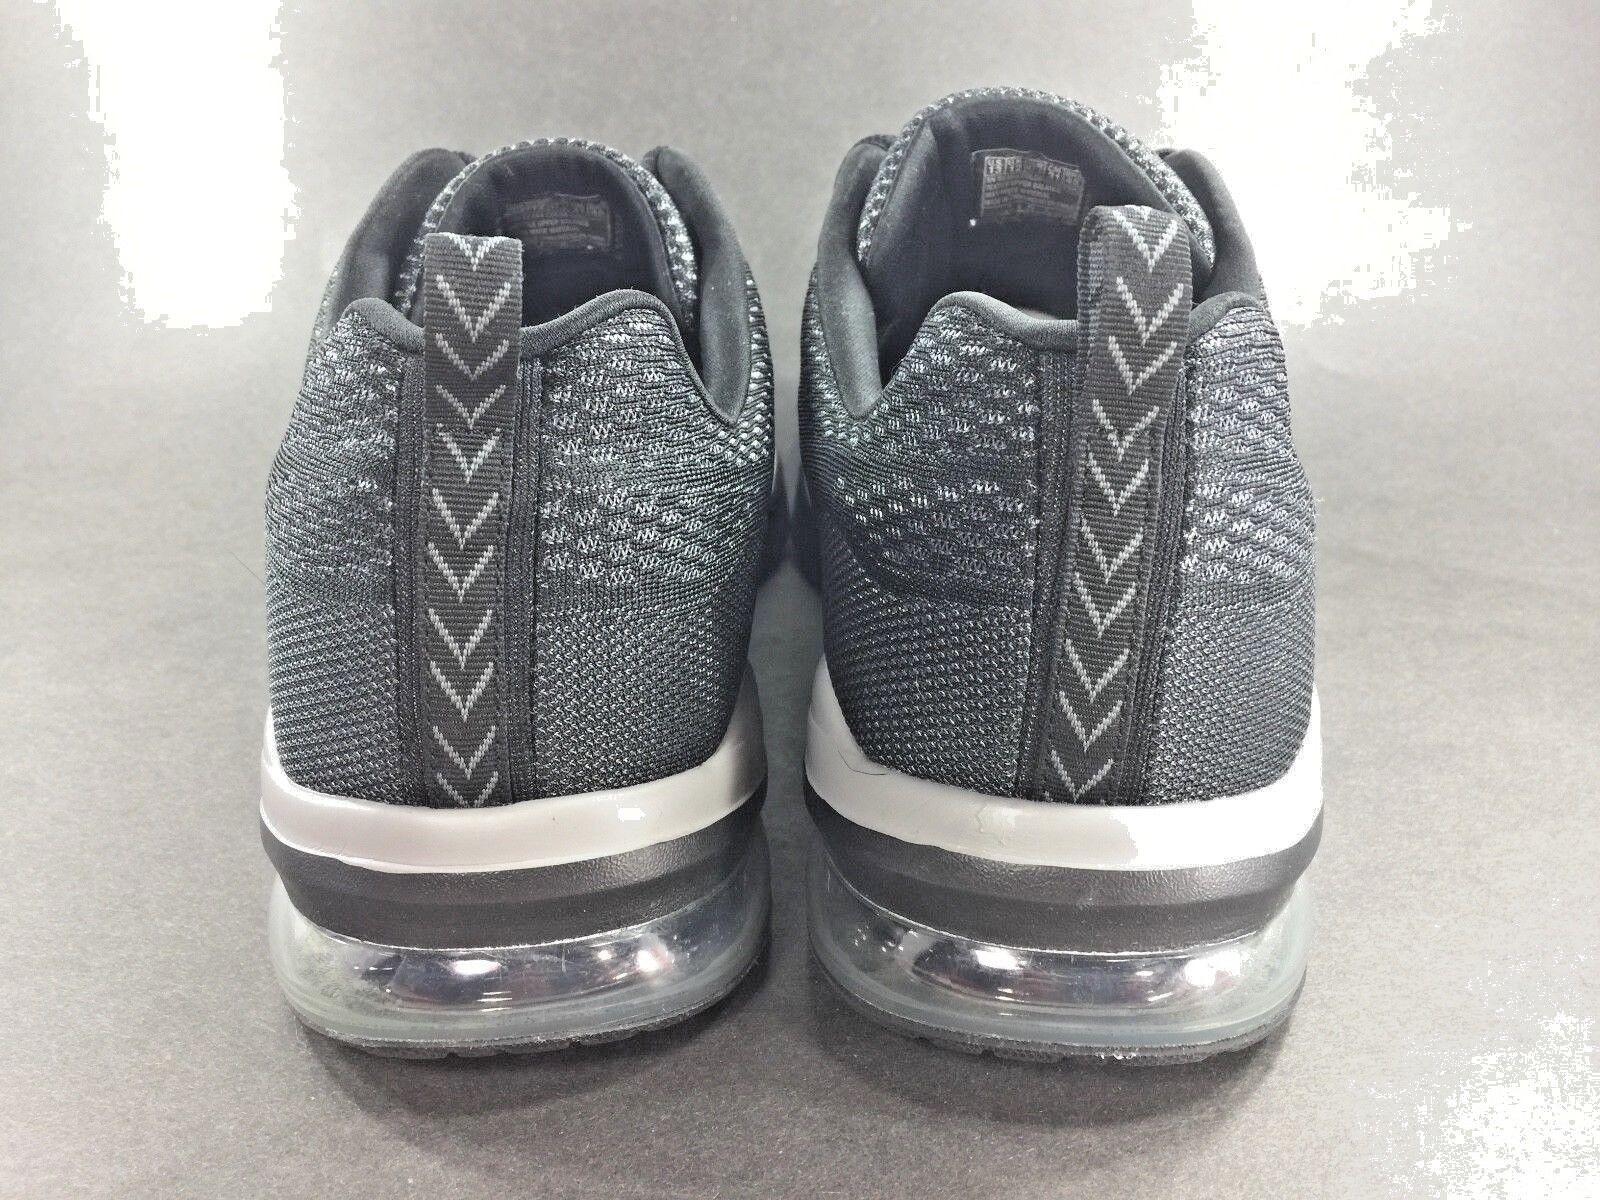 Skechers™  SPORT SKETCH AIR TRAINING Schuhes  51484  NEAR Men Sz 13  NEAR  MINT 649008